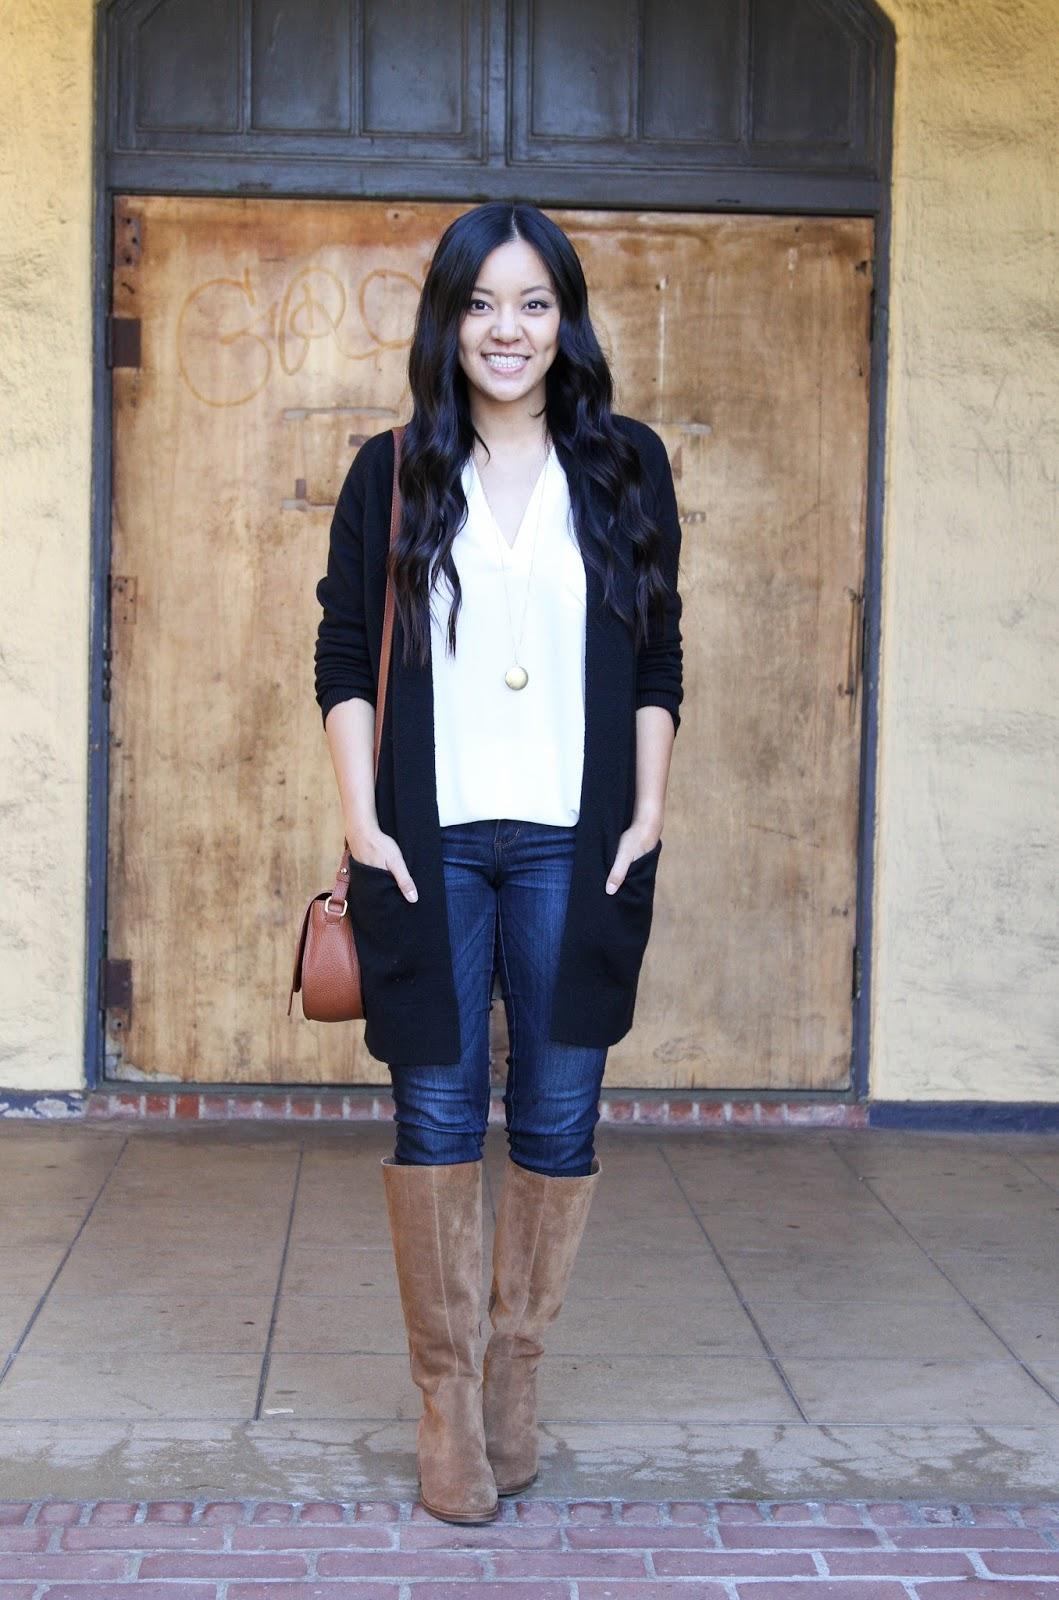 Black Cardigan + White Tunic + Pendant Necklace + Riding Boots